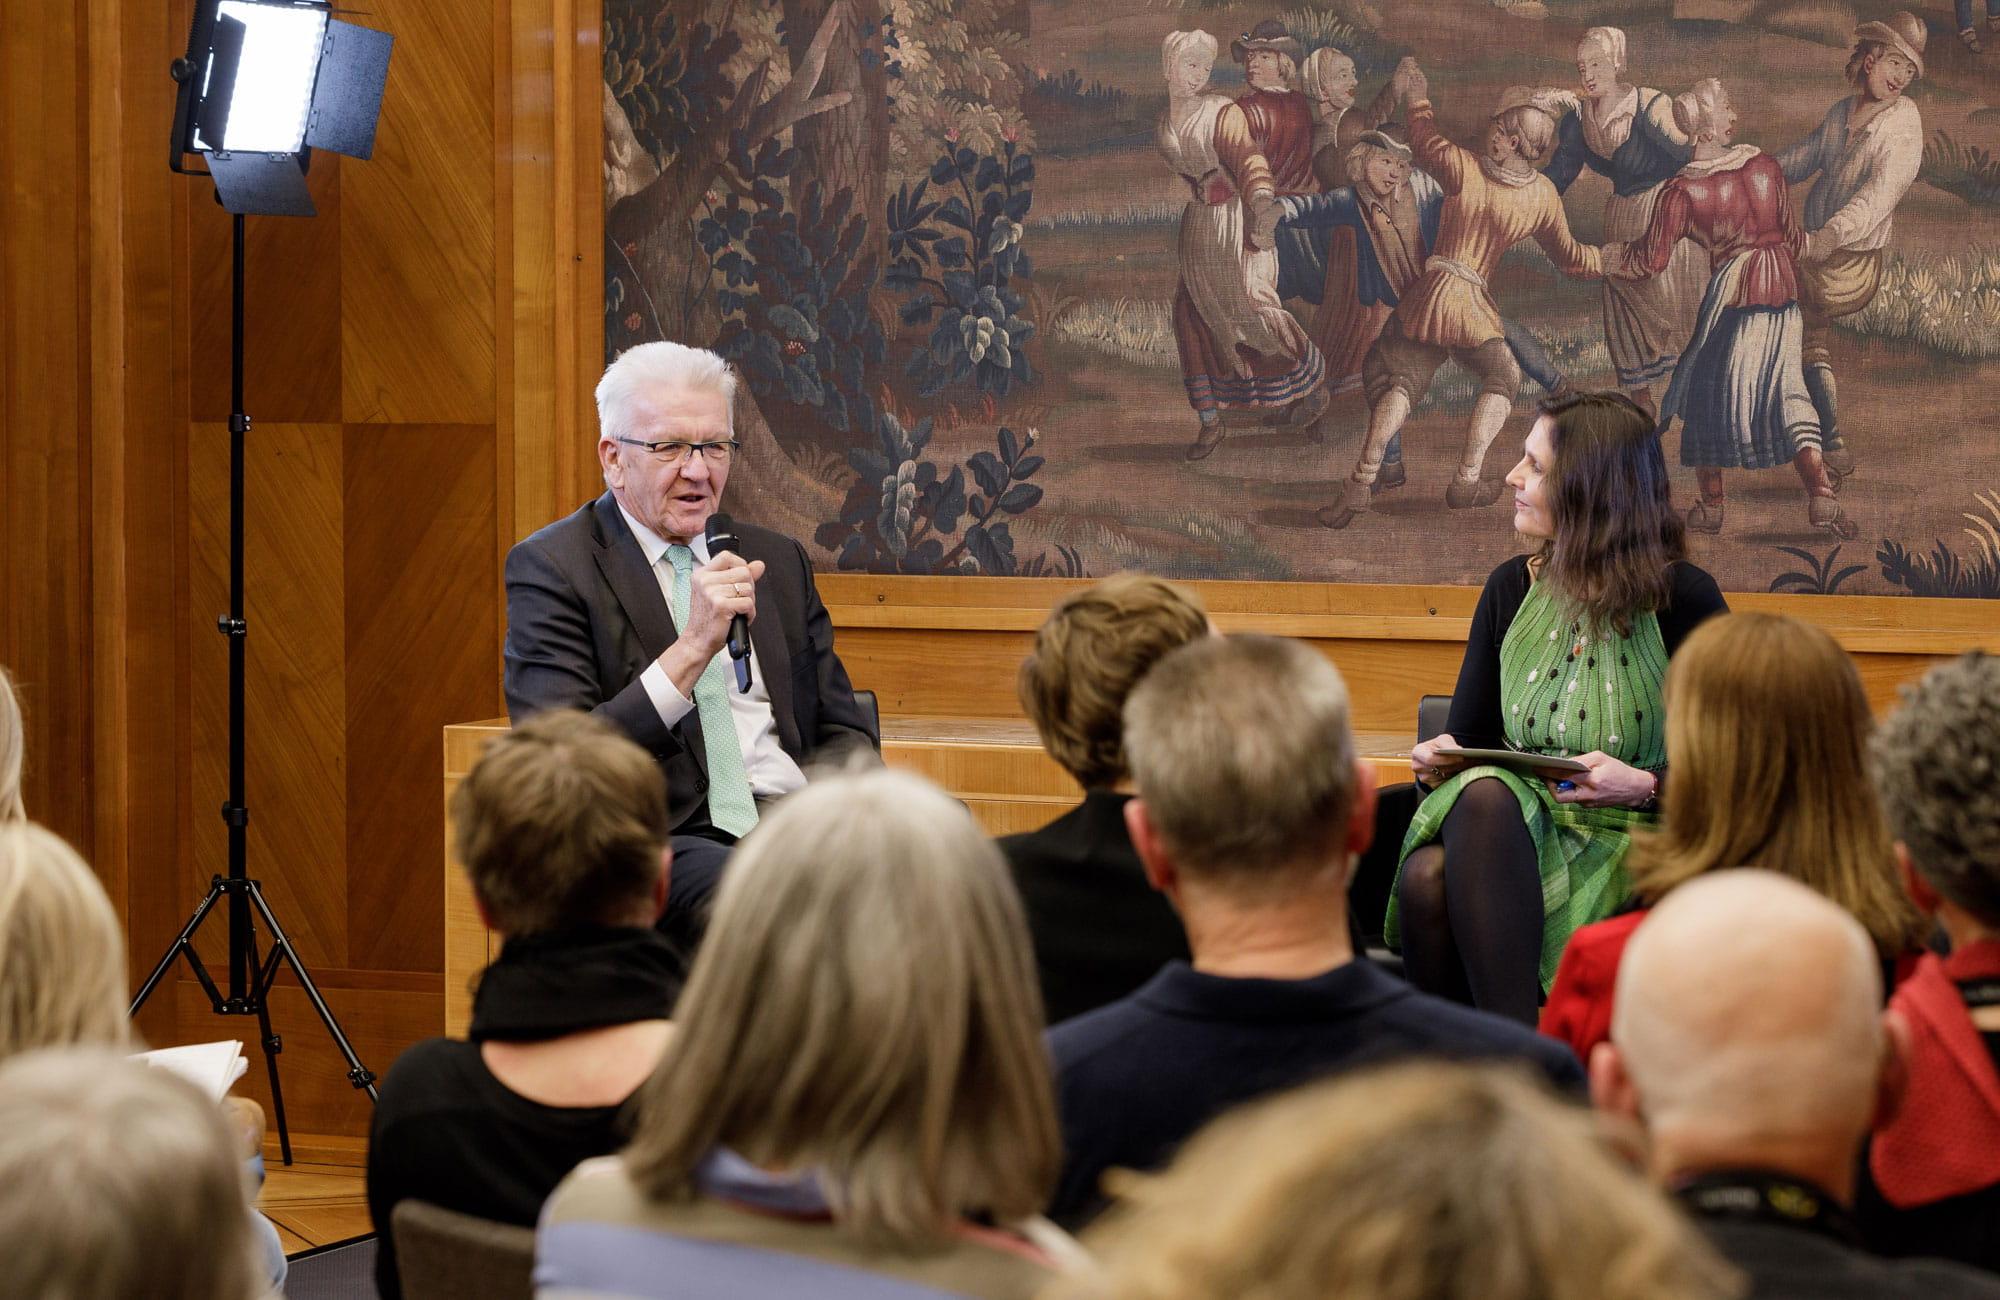 Winfried Kretschmann, Matthias Politycki: Kultur in der Villa <br/>(c) Quelle Staatsministerium / Jan Potente